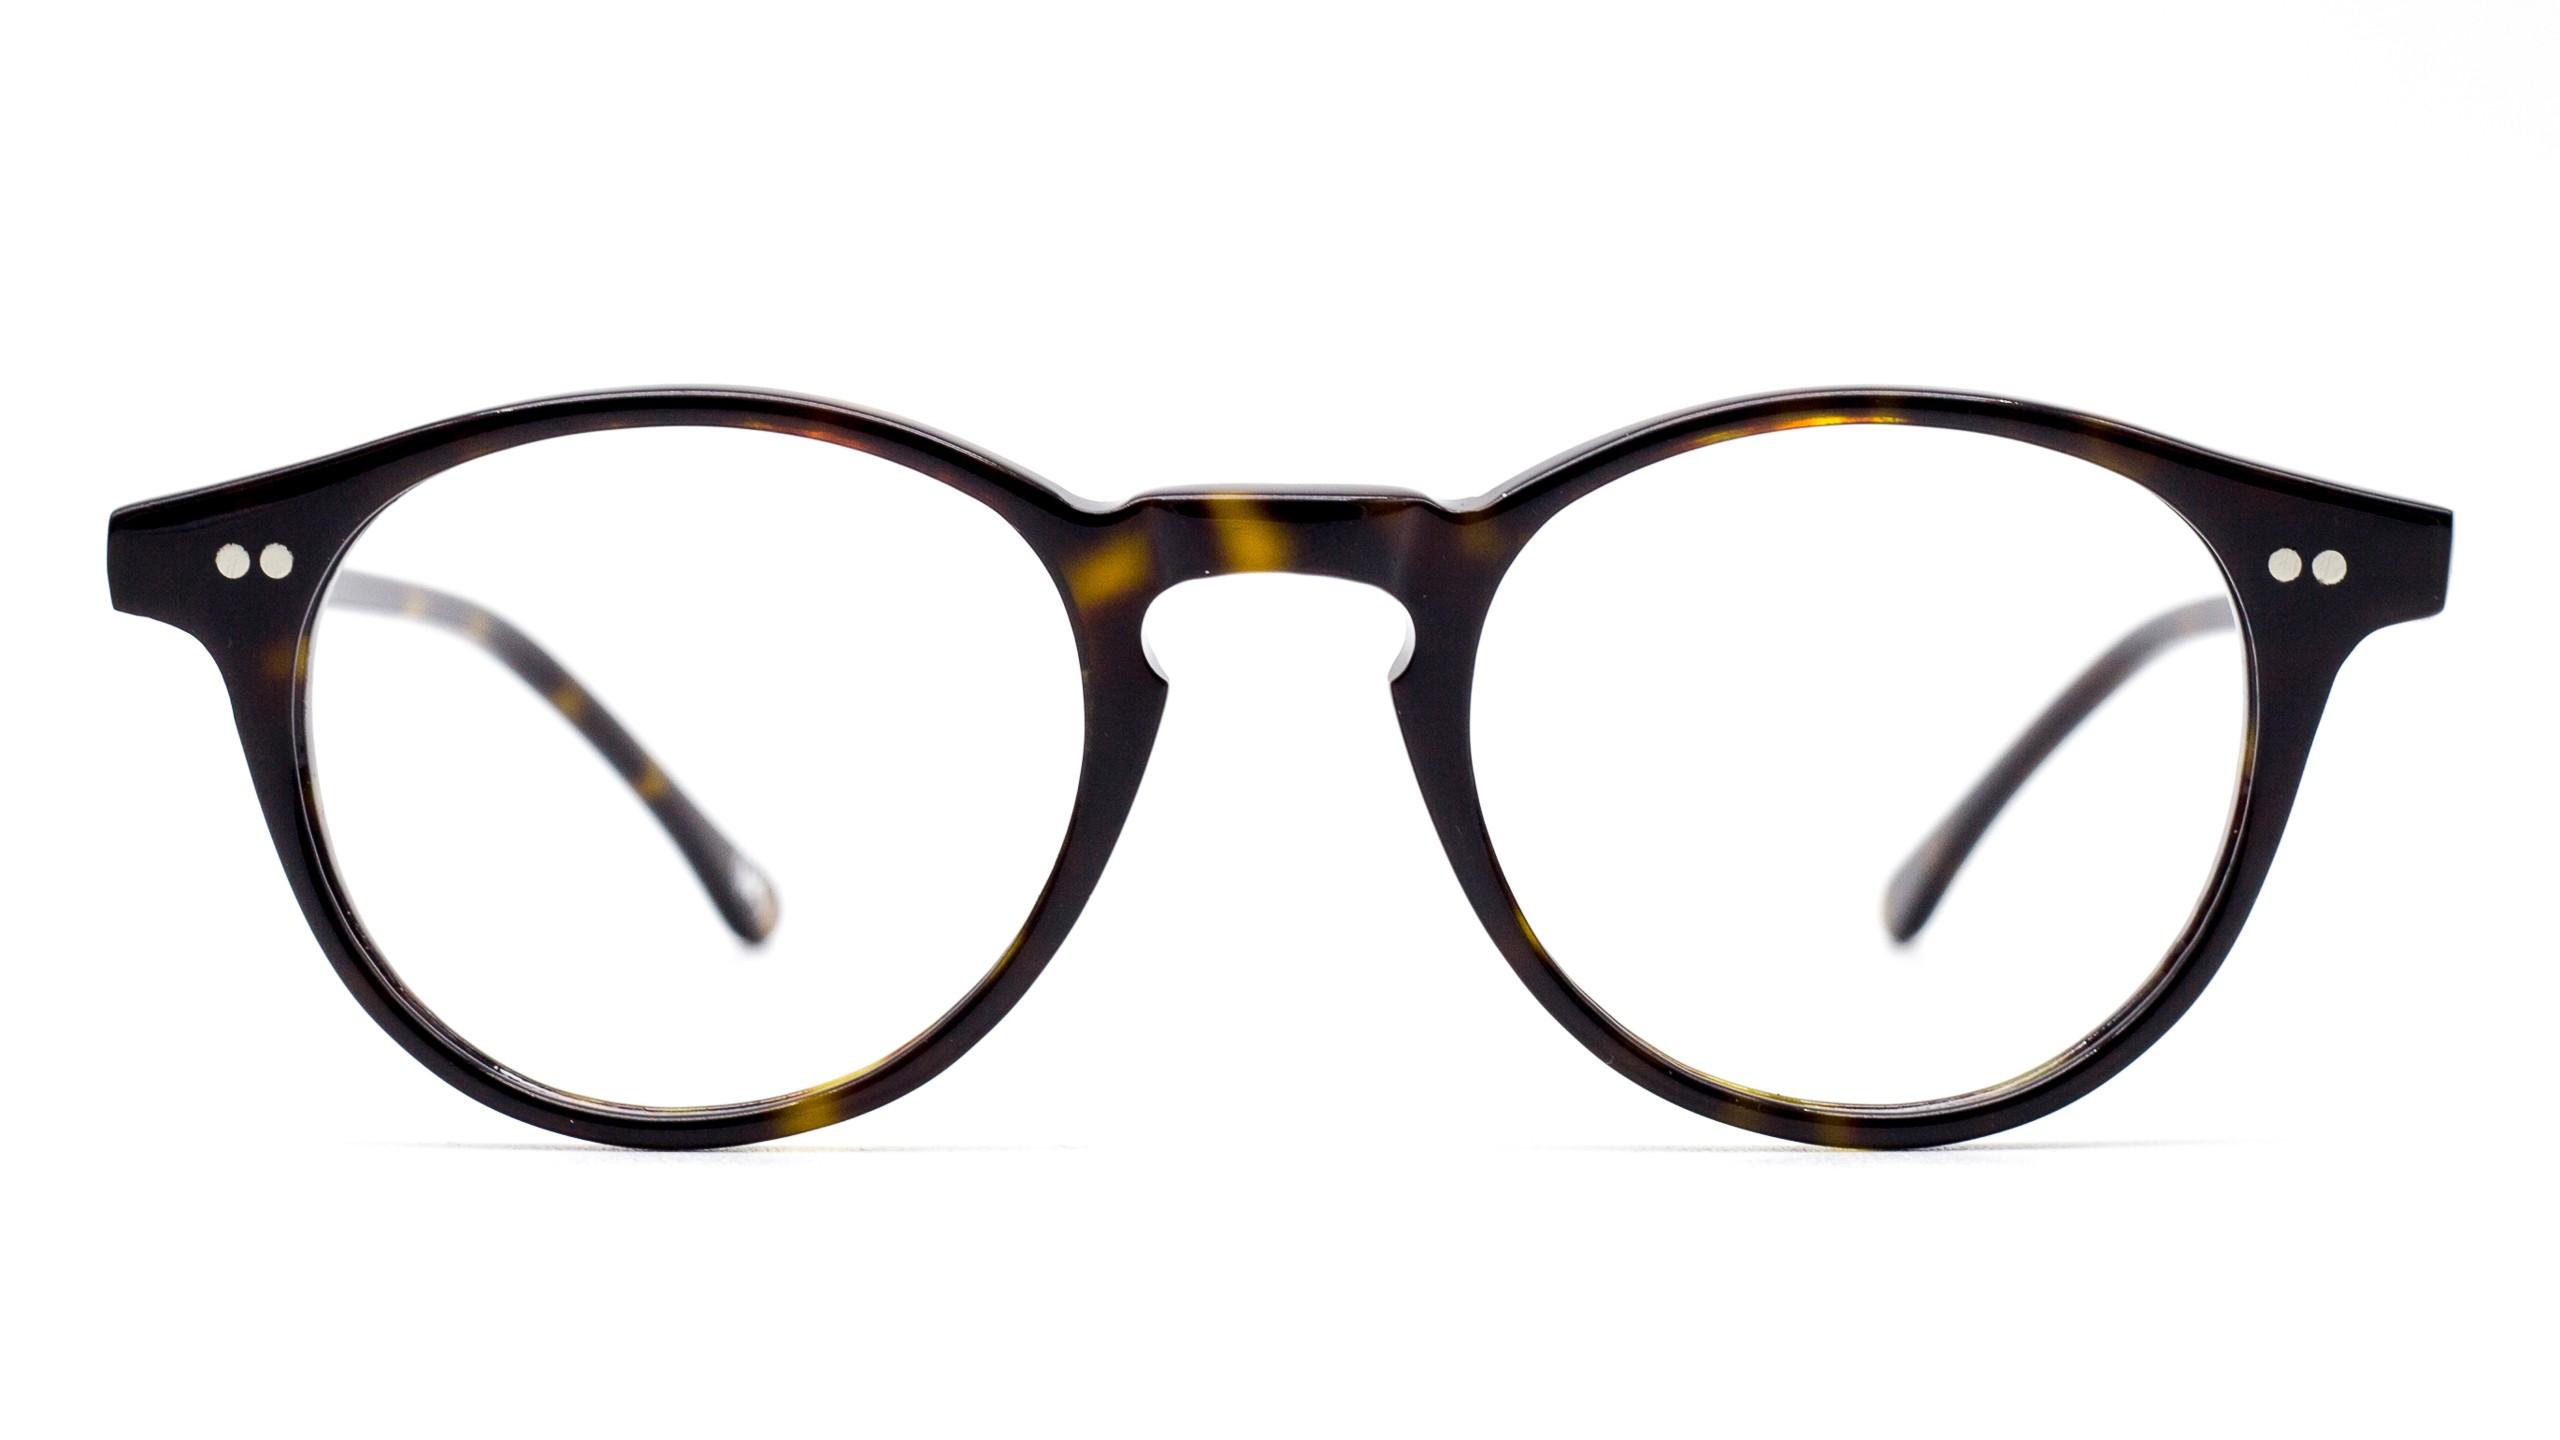 Occhiali-Nathan-Kaltermann-made-in-Italy-eyeglassesAndrew-C01-Vista1